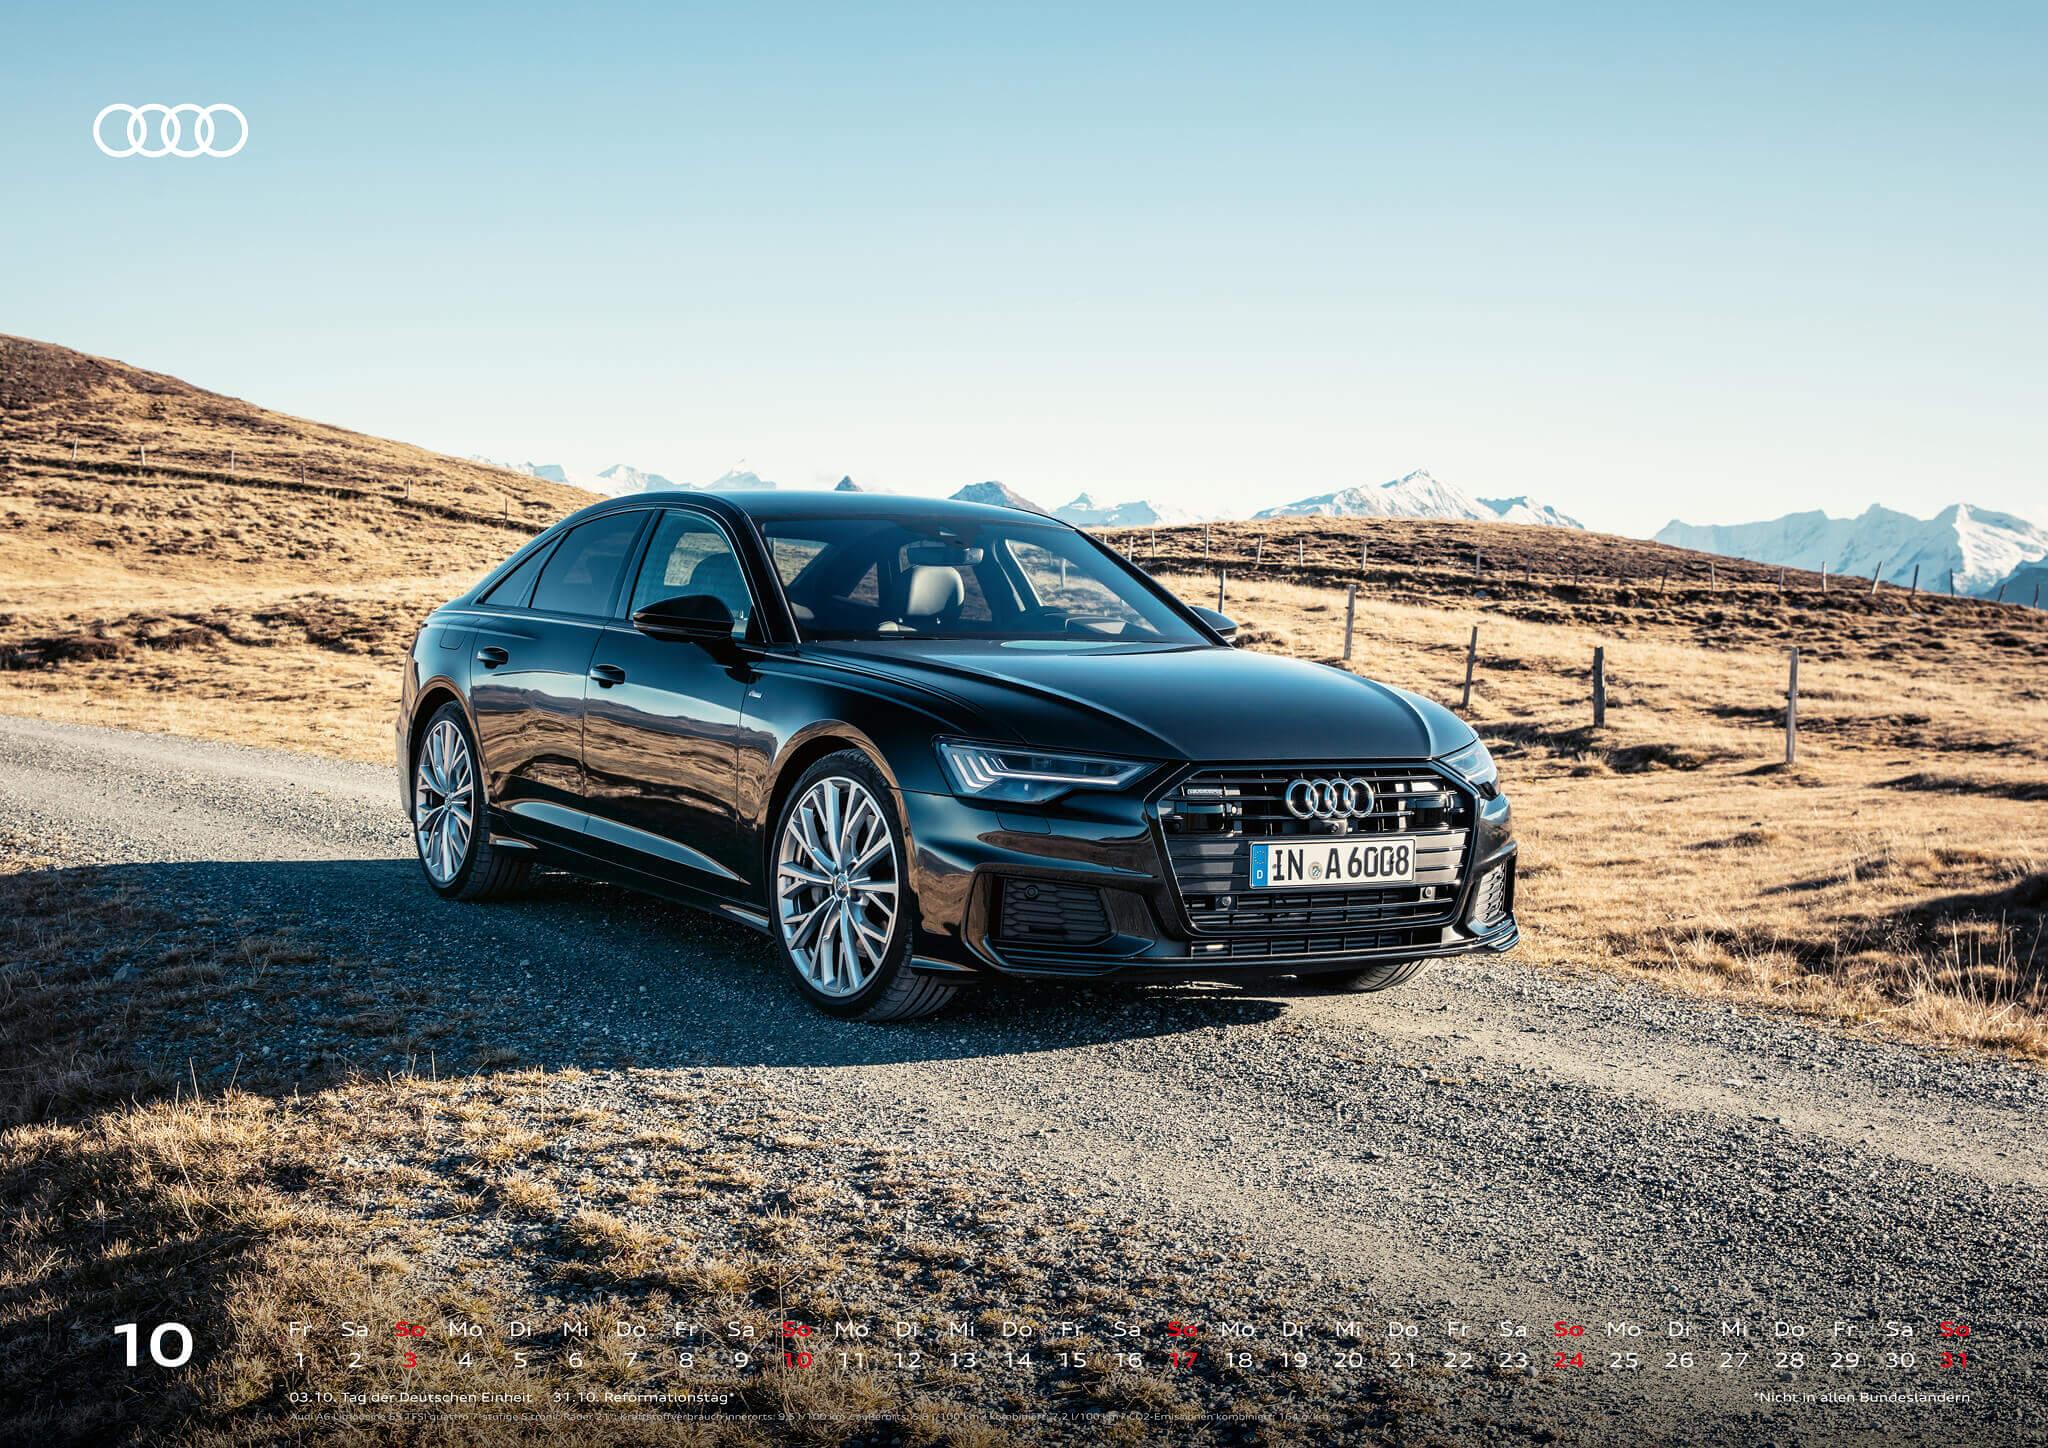 Audi Kalender 2021 - DIN A2 / Audi A6 Limousine